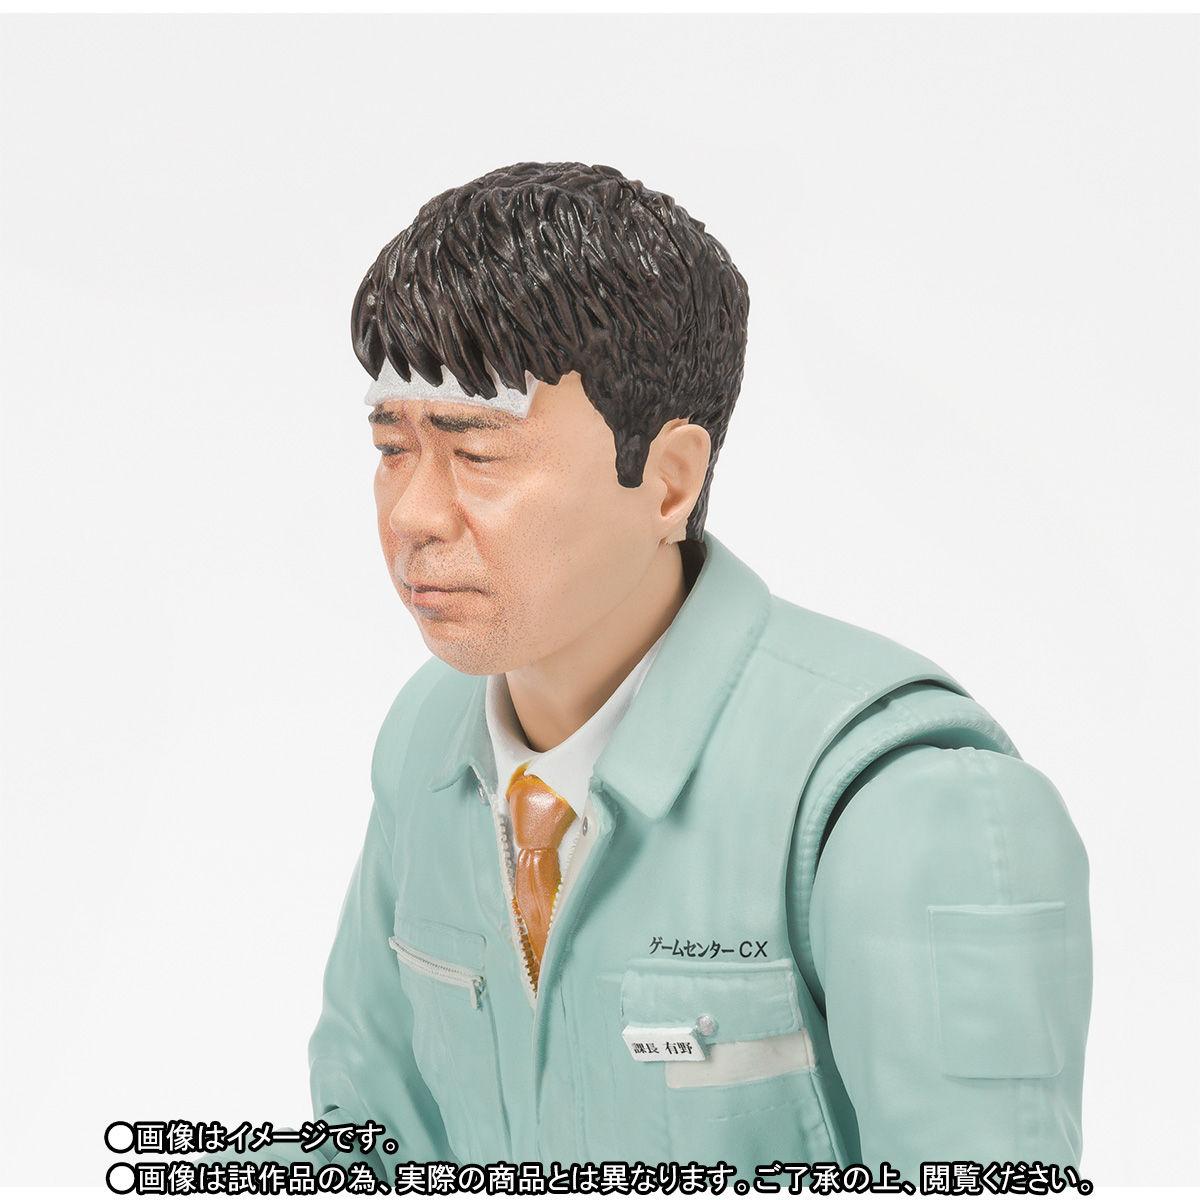 S.H.Figuarts ゲームセンターCX 有野課長(いけそう缶Ver.)-008